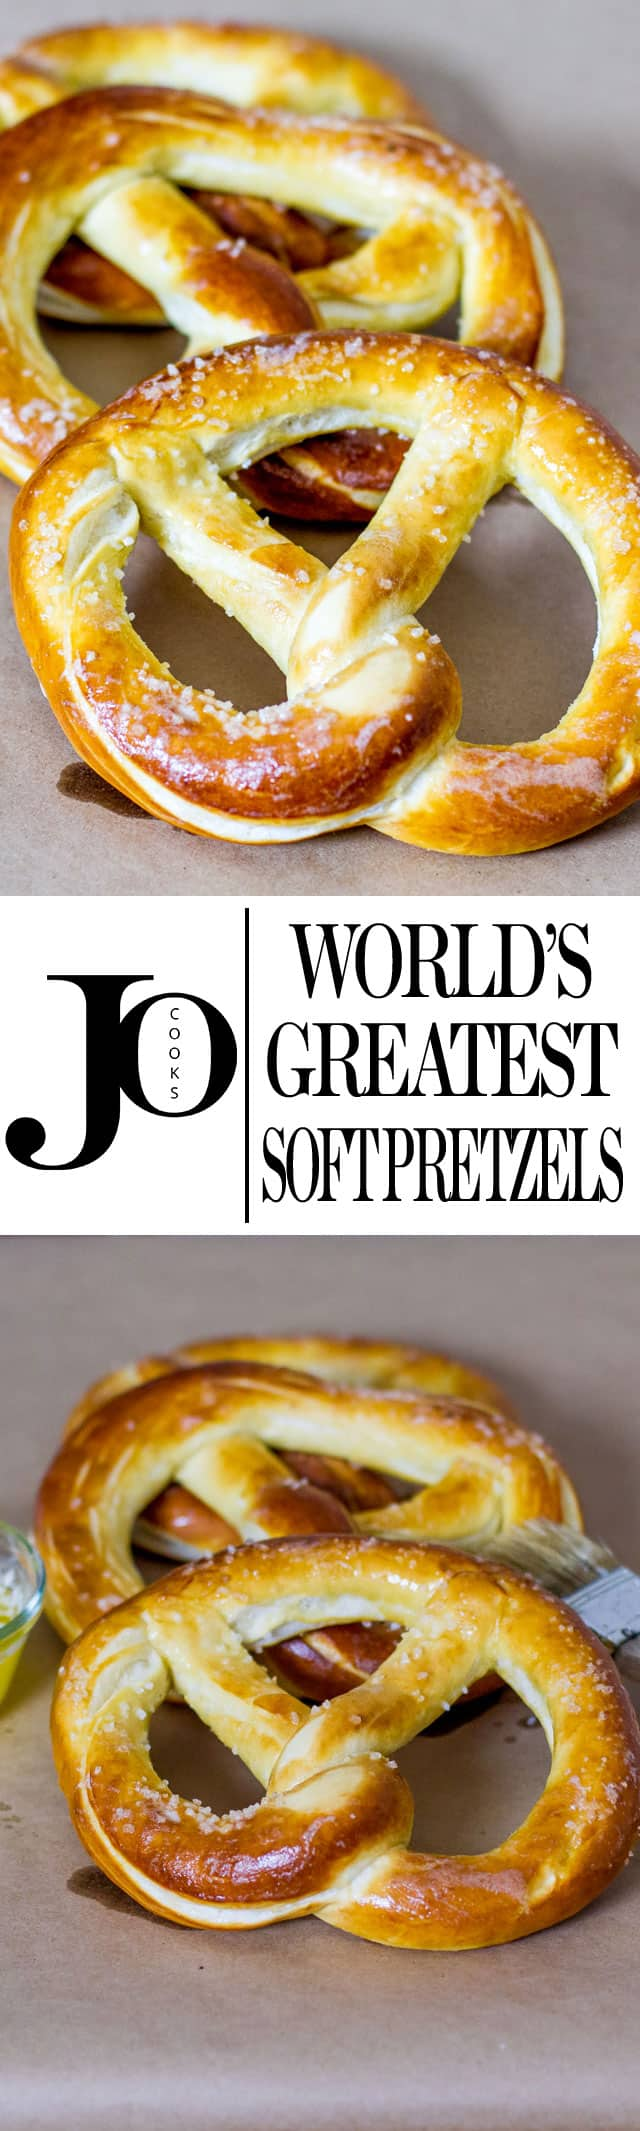 World's Greatest Soft Pretzels photo collage